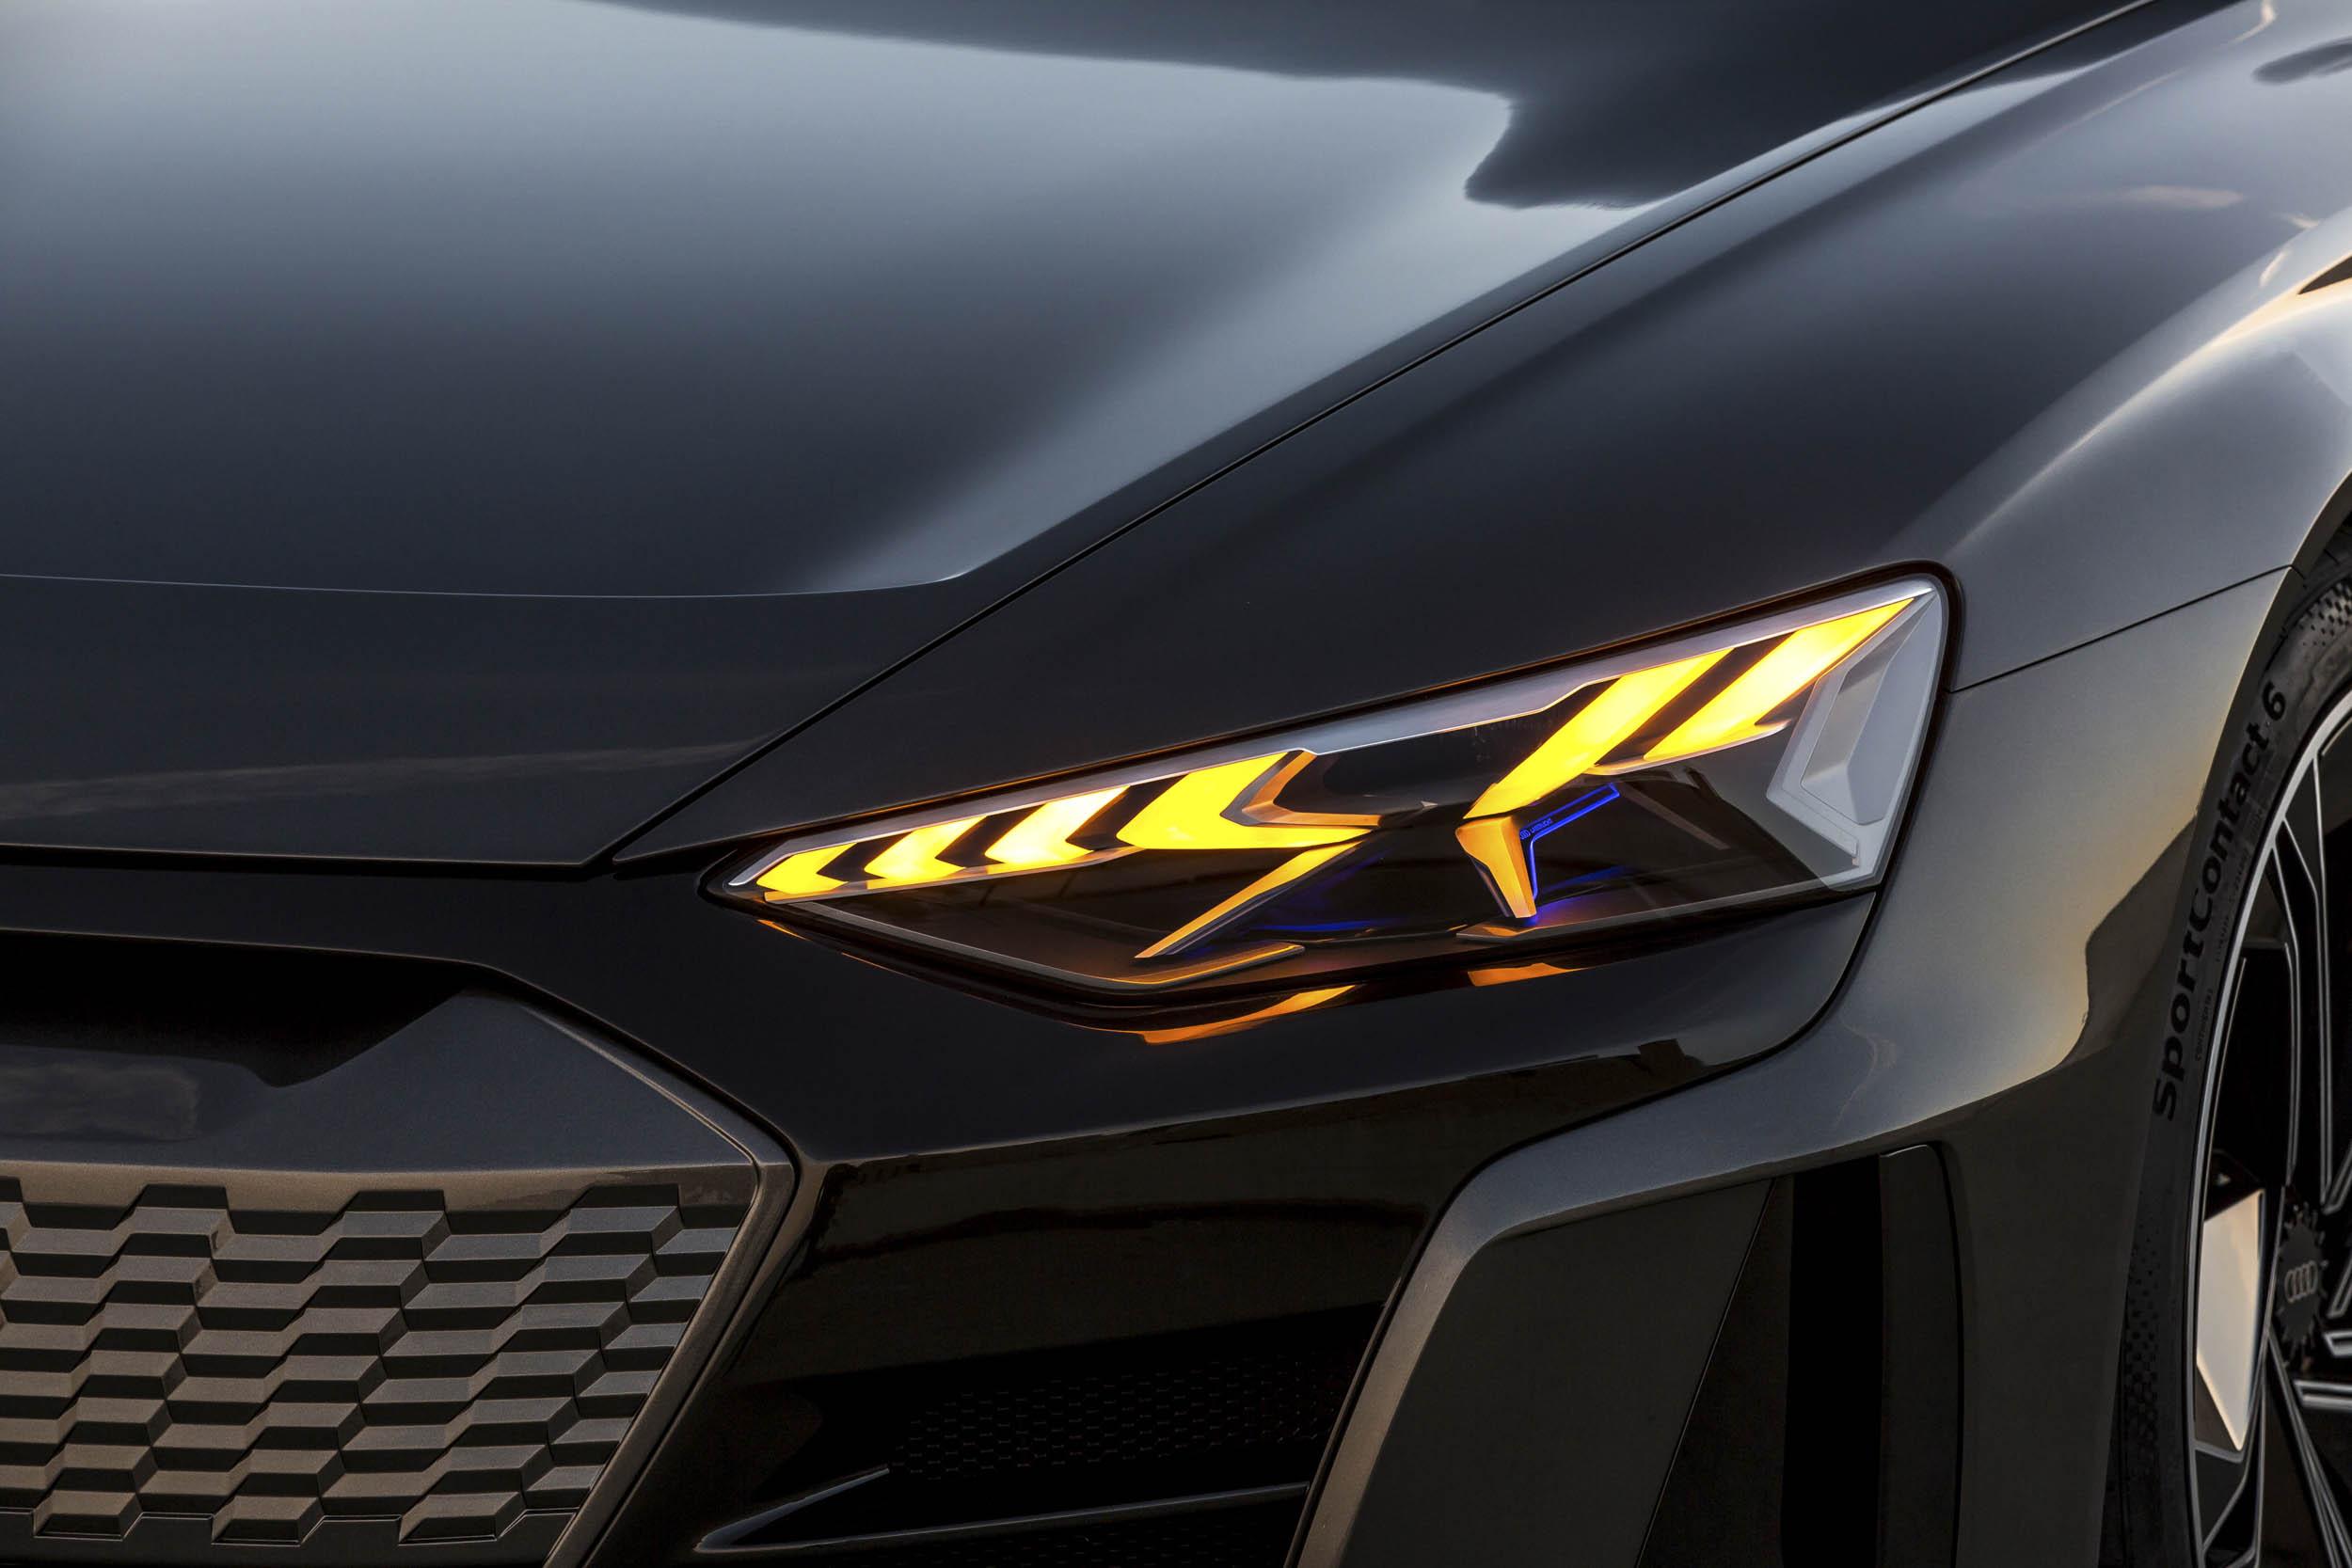 Audi e-tron GT headlight detail